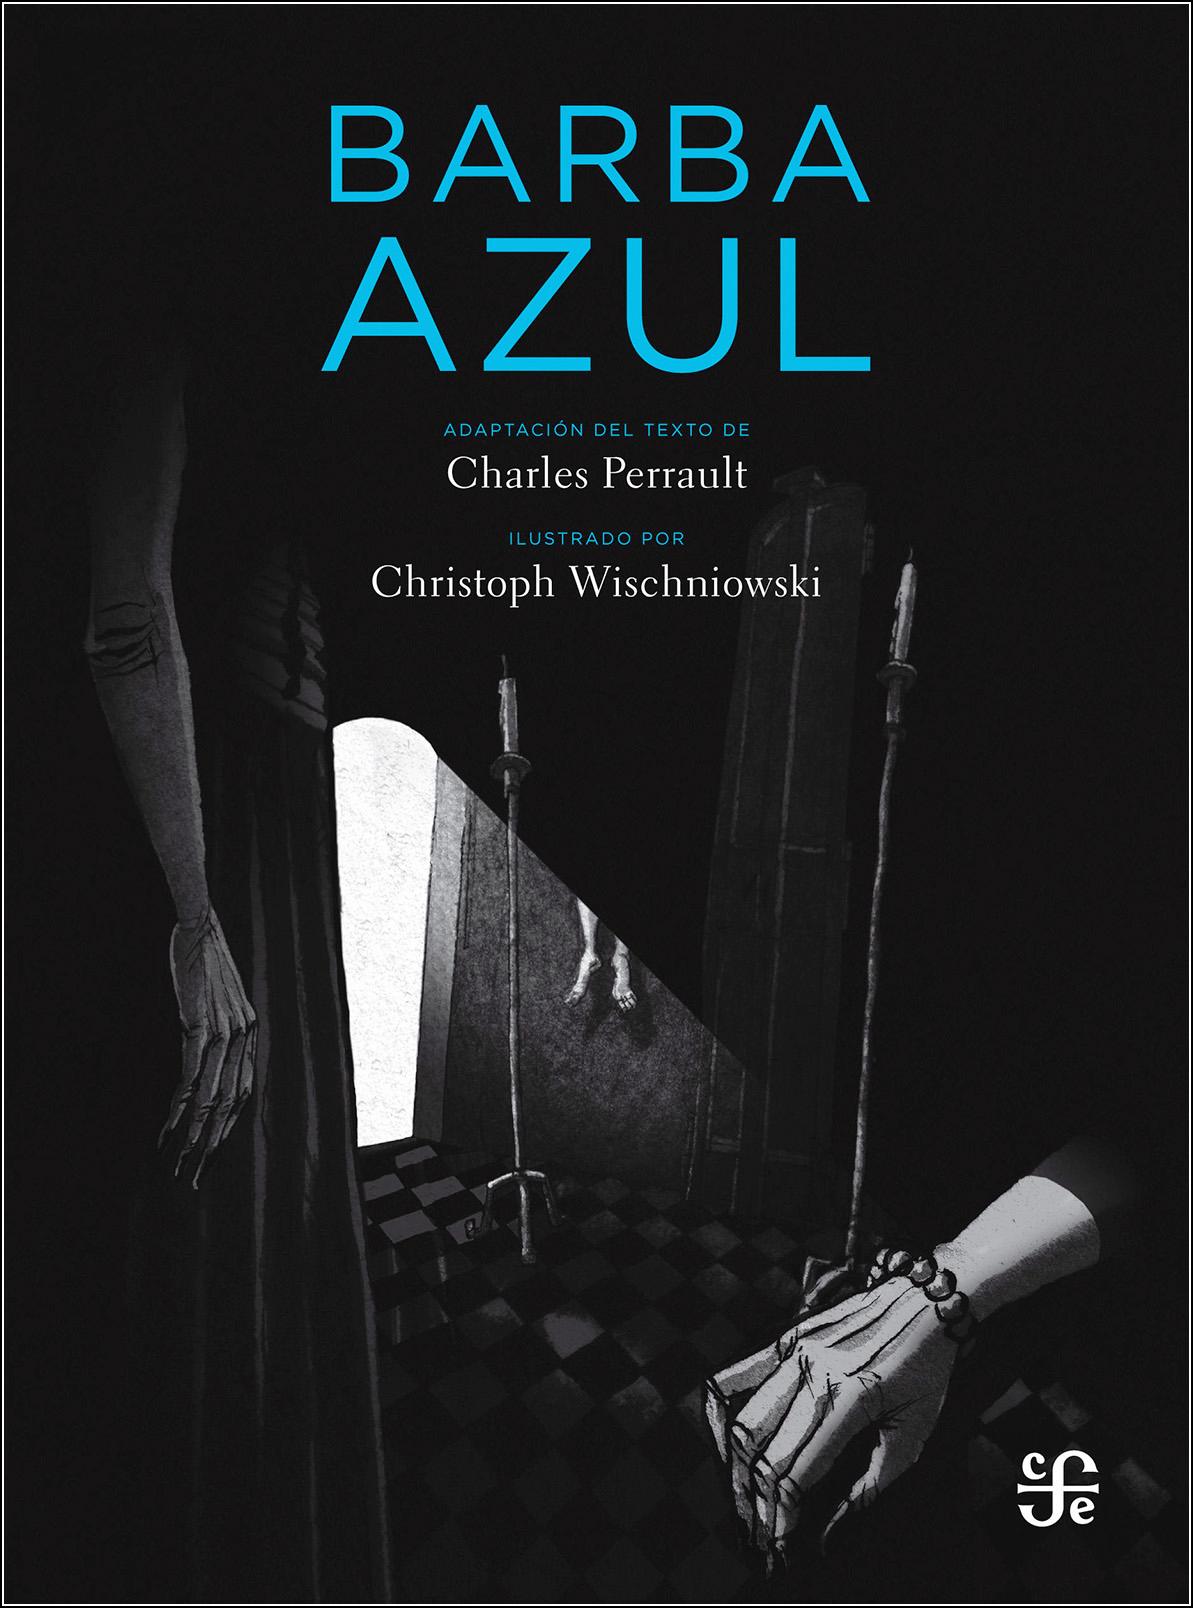 Christoph Wischniowski, Barba Azul